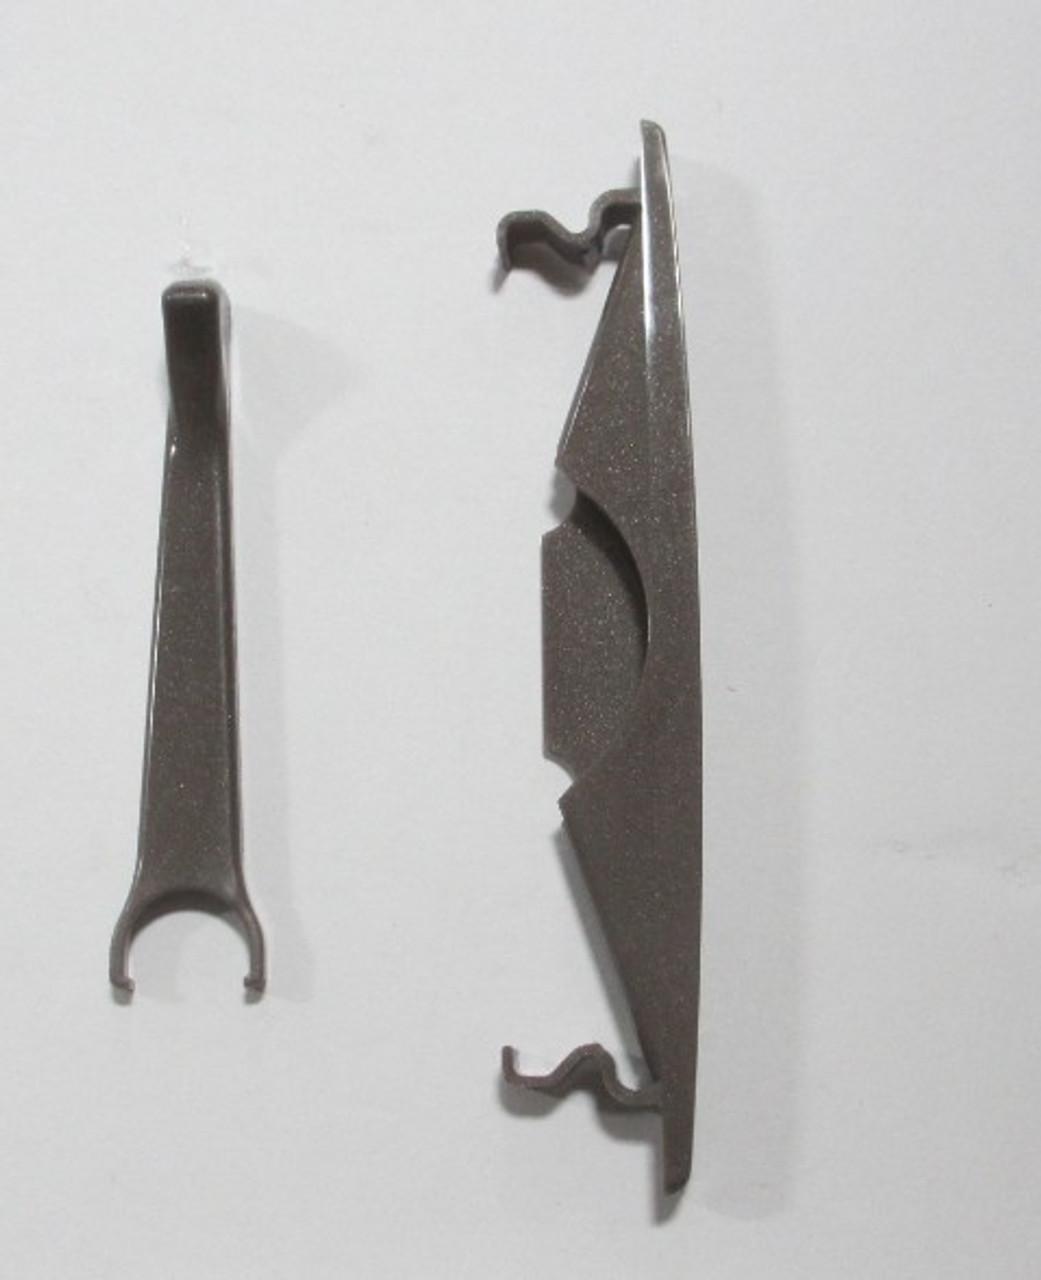 Shelter Sash lock lever and bezel for the encore hardware September 2007 to present